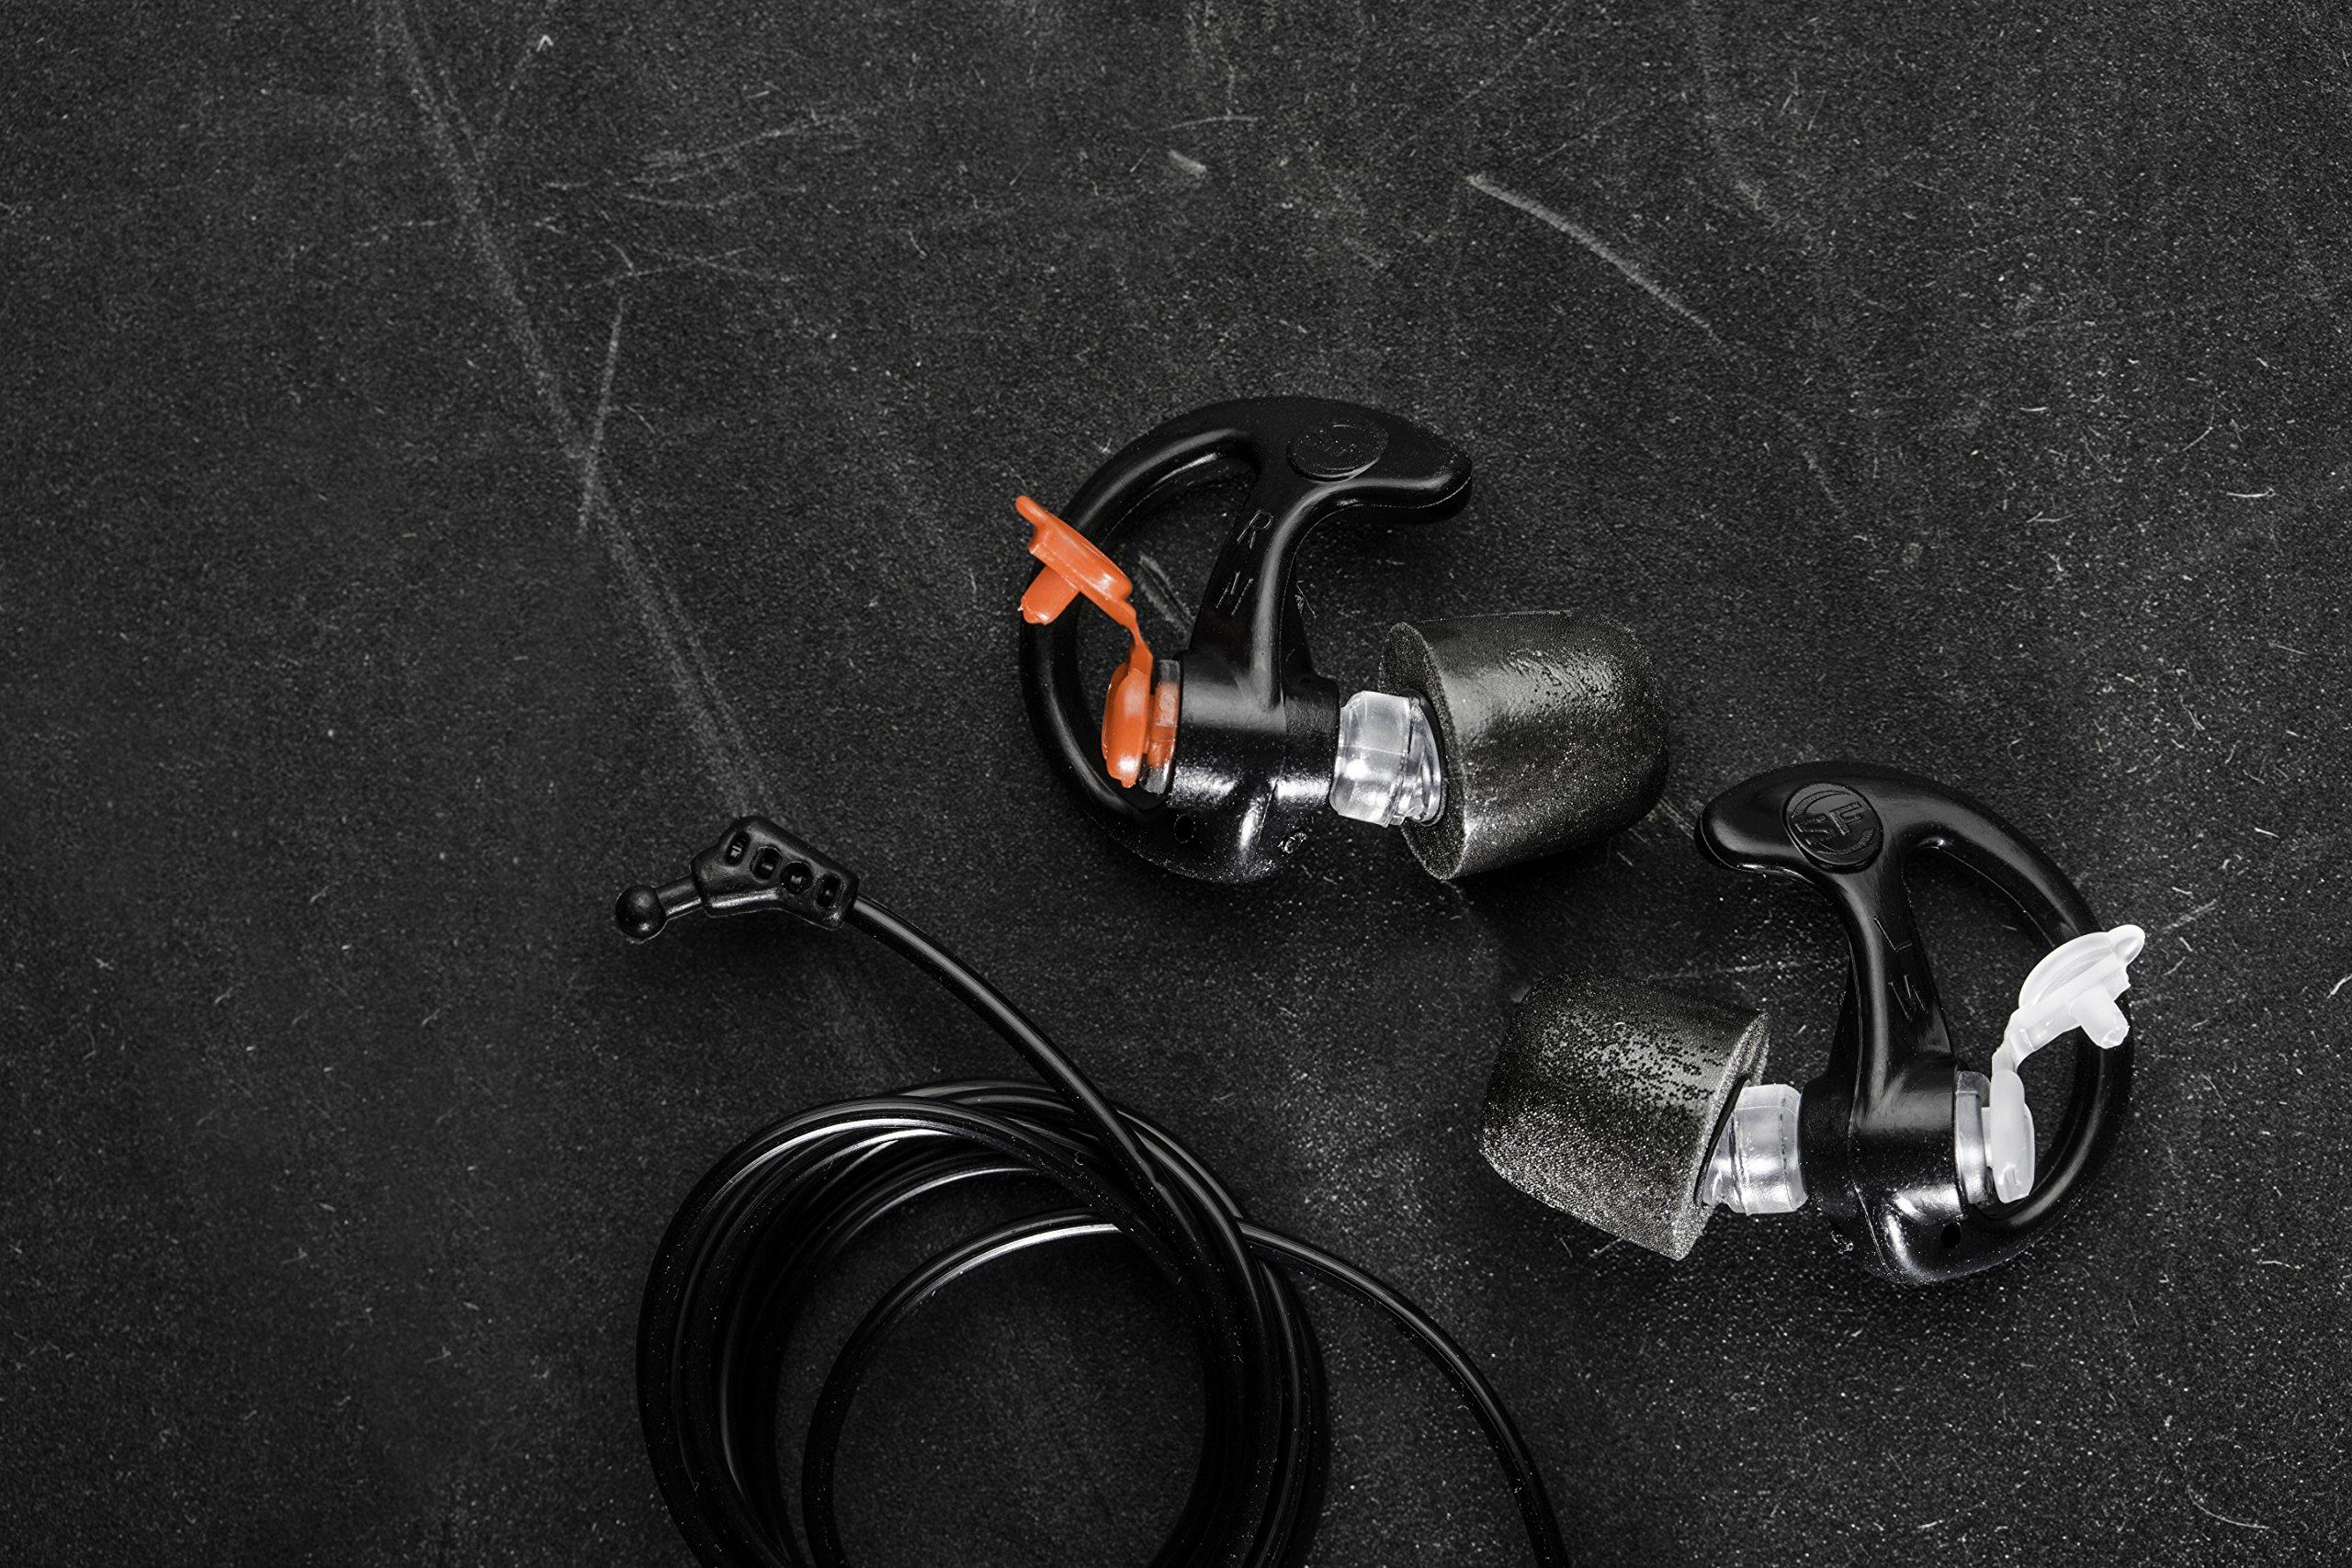 Earpro Sonic Defenders Ultra Foam-Tipped Earplugs (EP7), 28 dB, Large, Black, 1 Pair by SureFire